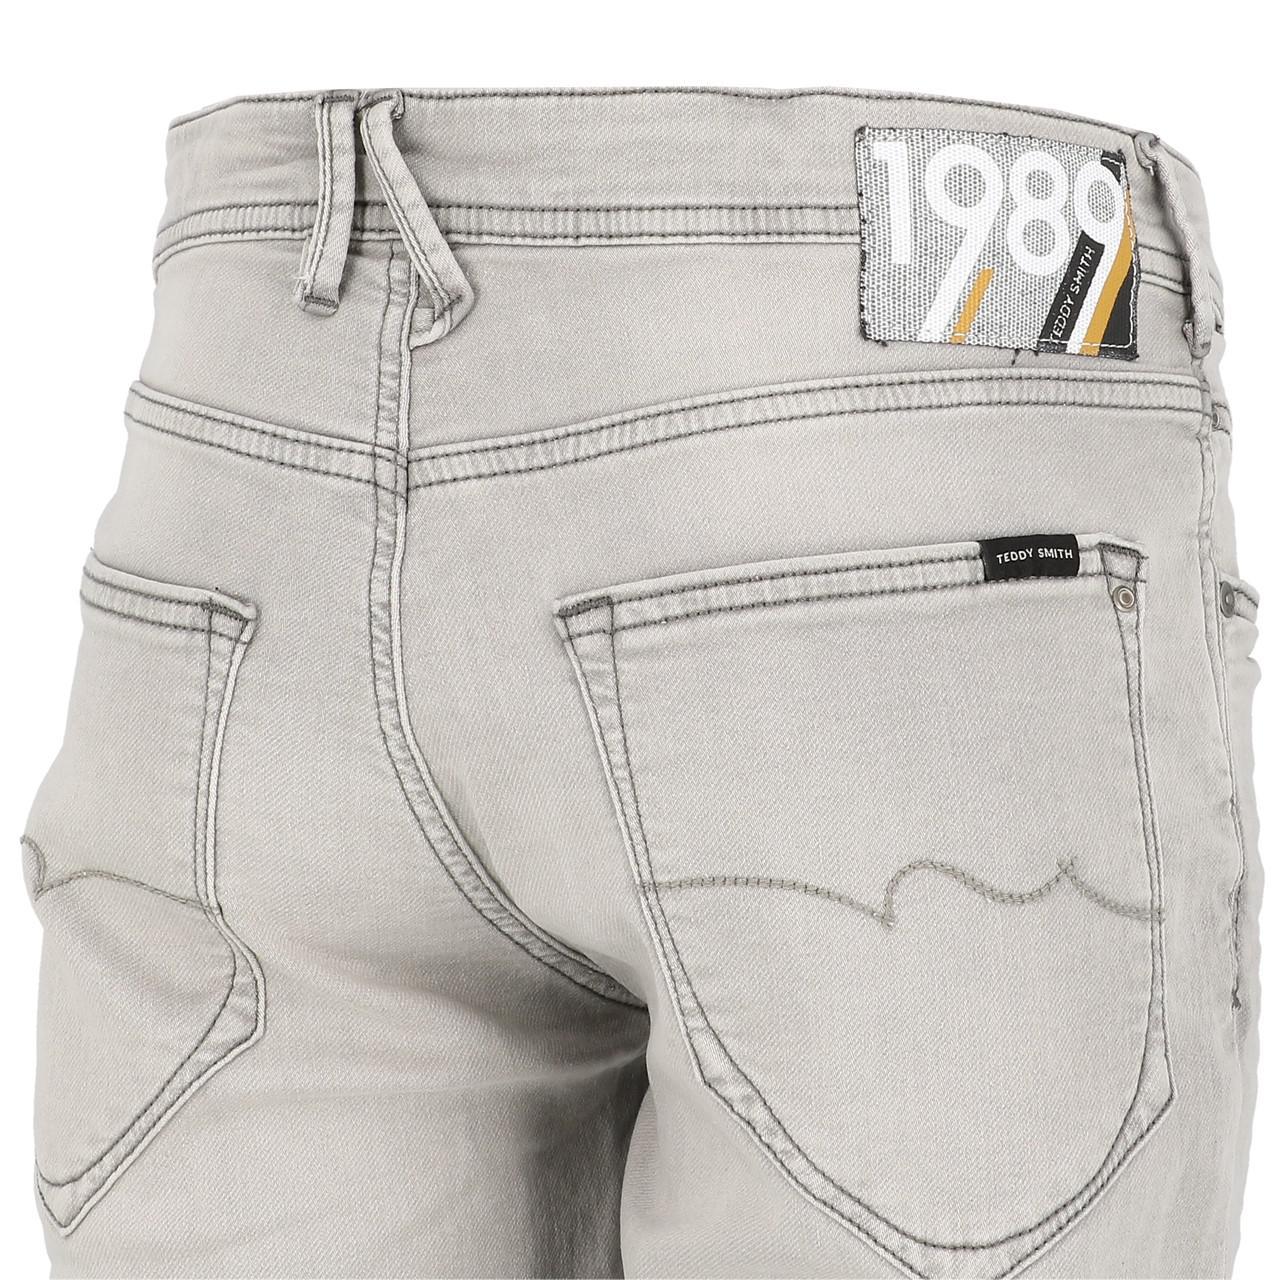 Bermuda-Shorts-Teddy-smith-Scotty-3-Grey-Shorts-Grey-29920-New thumbnail 3